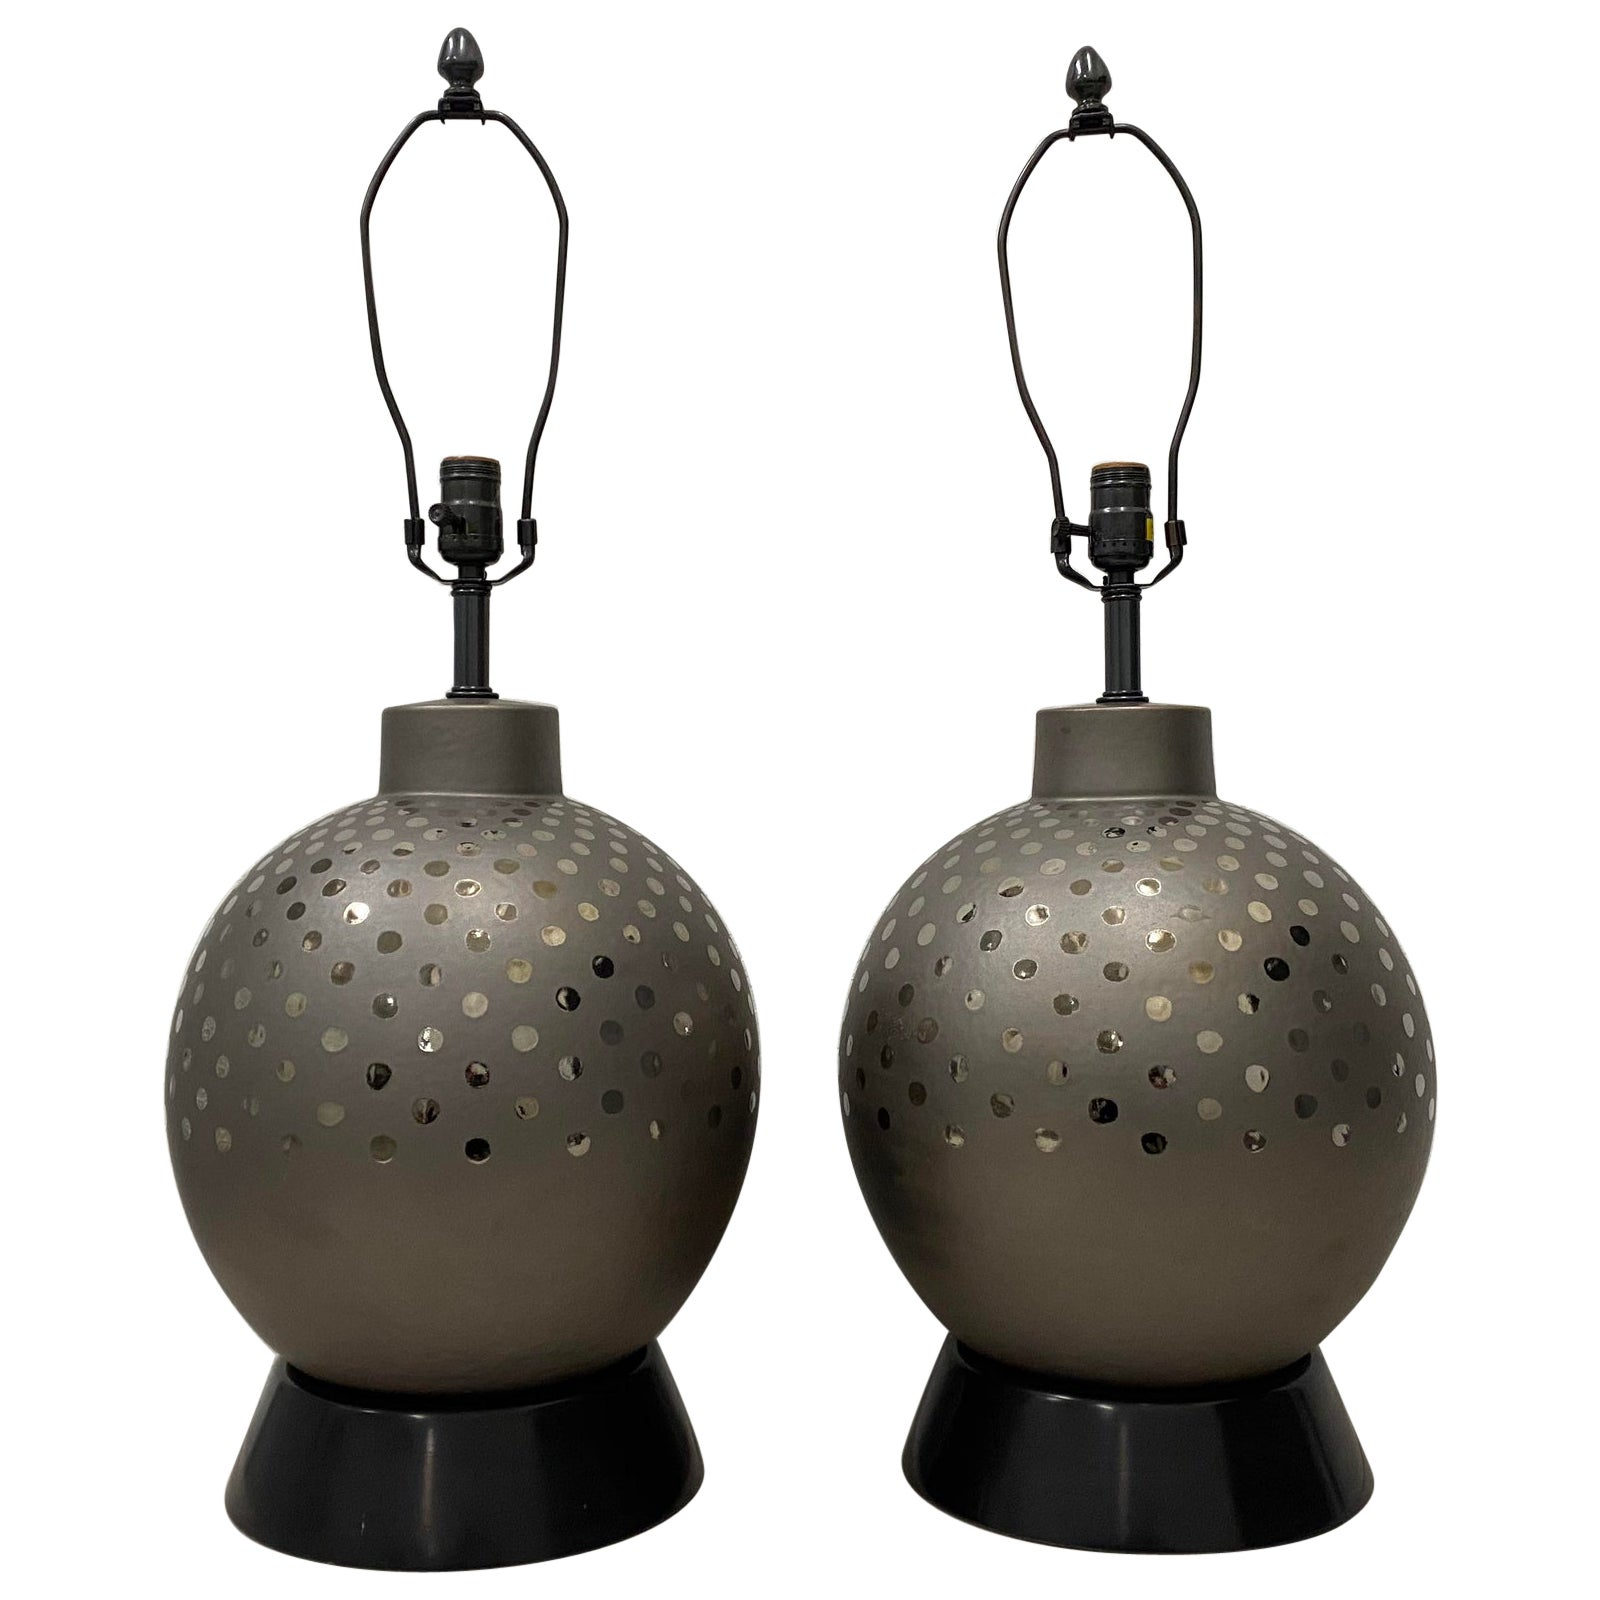 Pair of Vintage Ceramic Metallic Silver Glaze Ball Lamps by Marbro, circa 1970